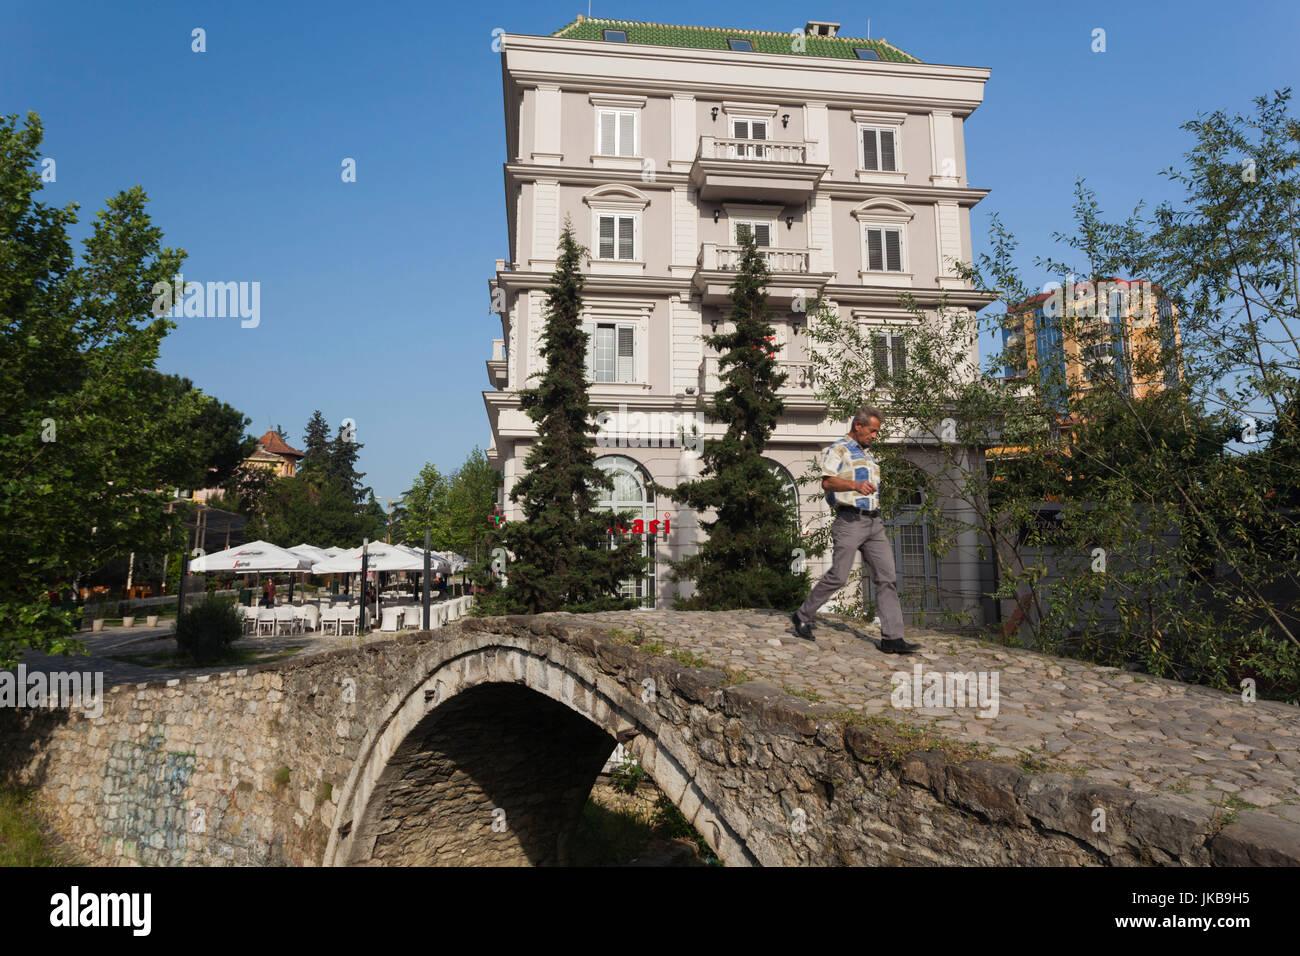 Albania, Tirana, Tanner's Bridge, old Ottoman Empire-era bridge - Stock Image